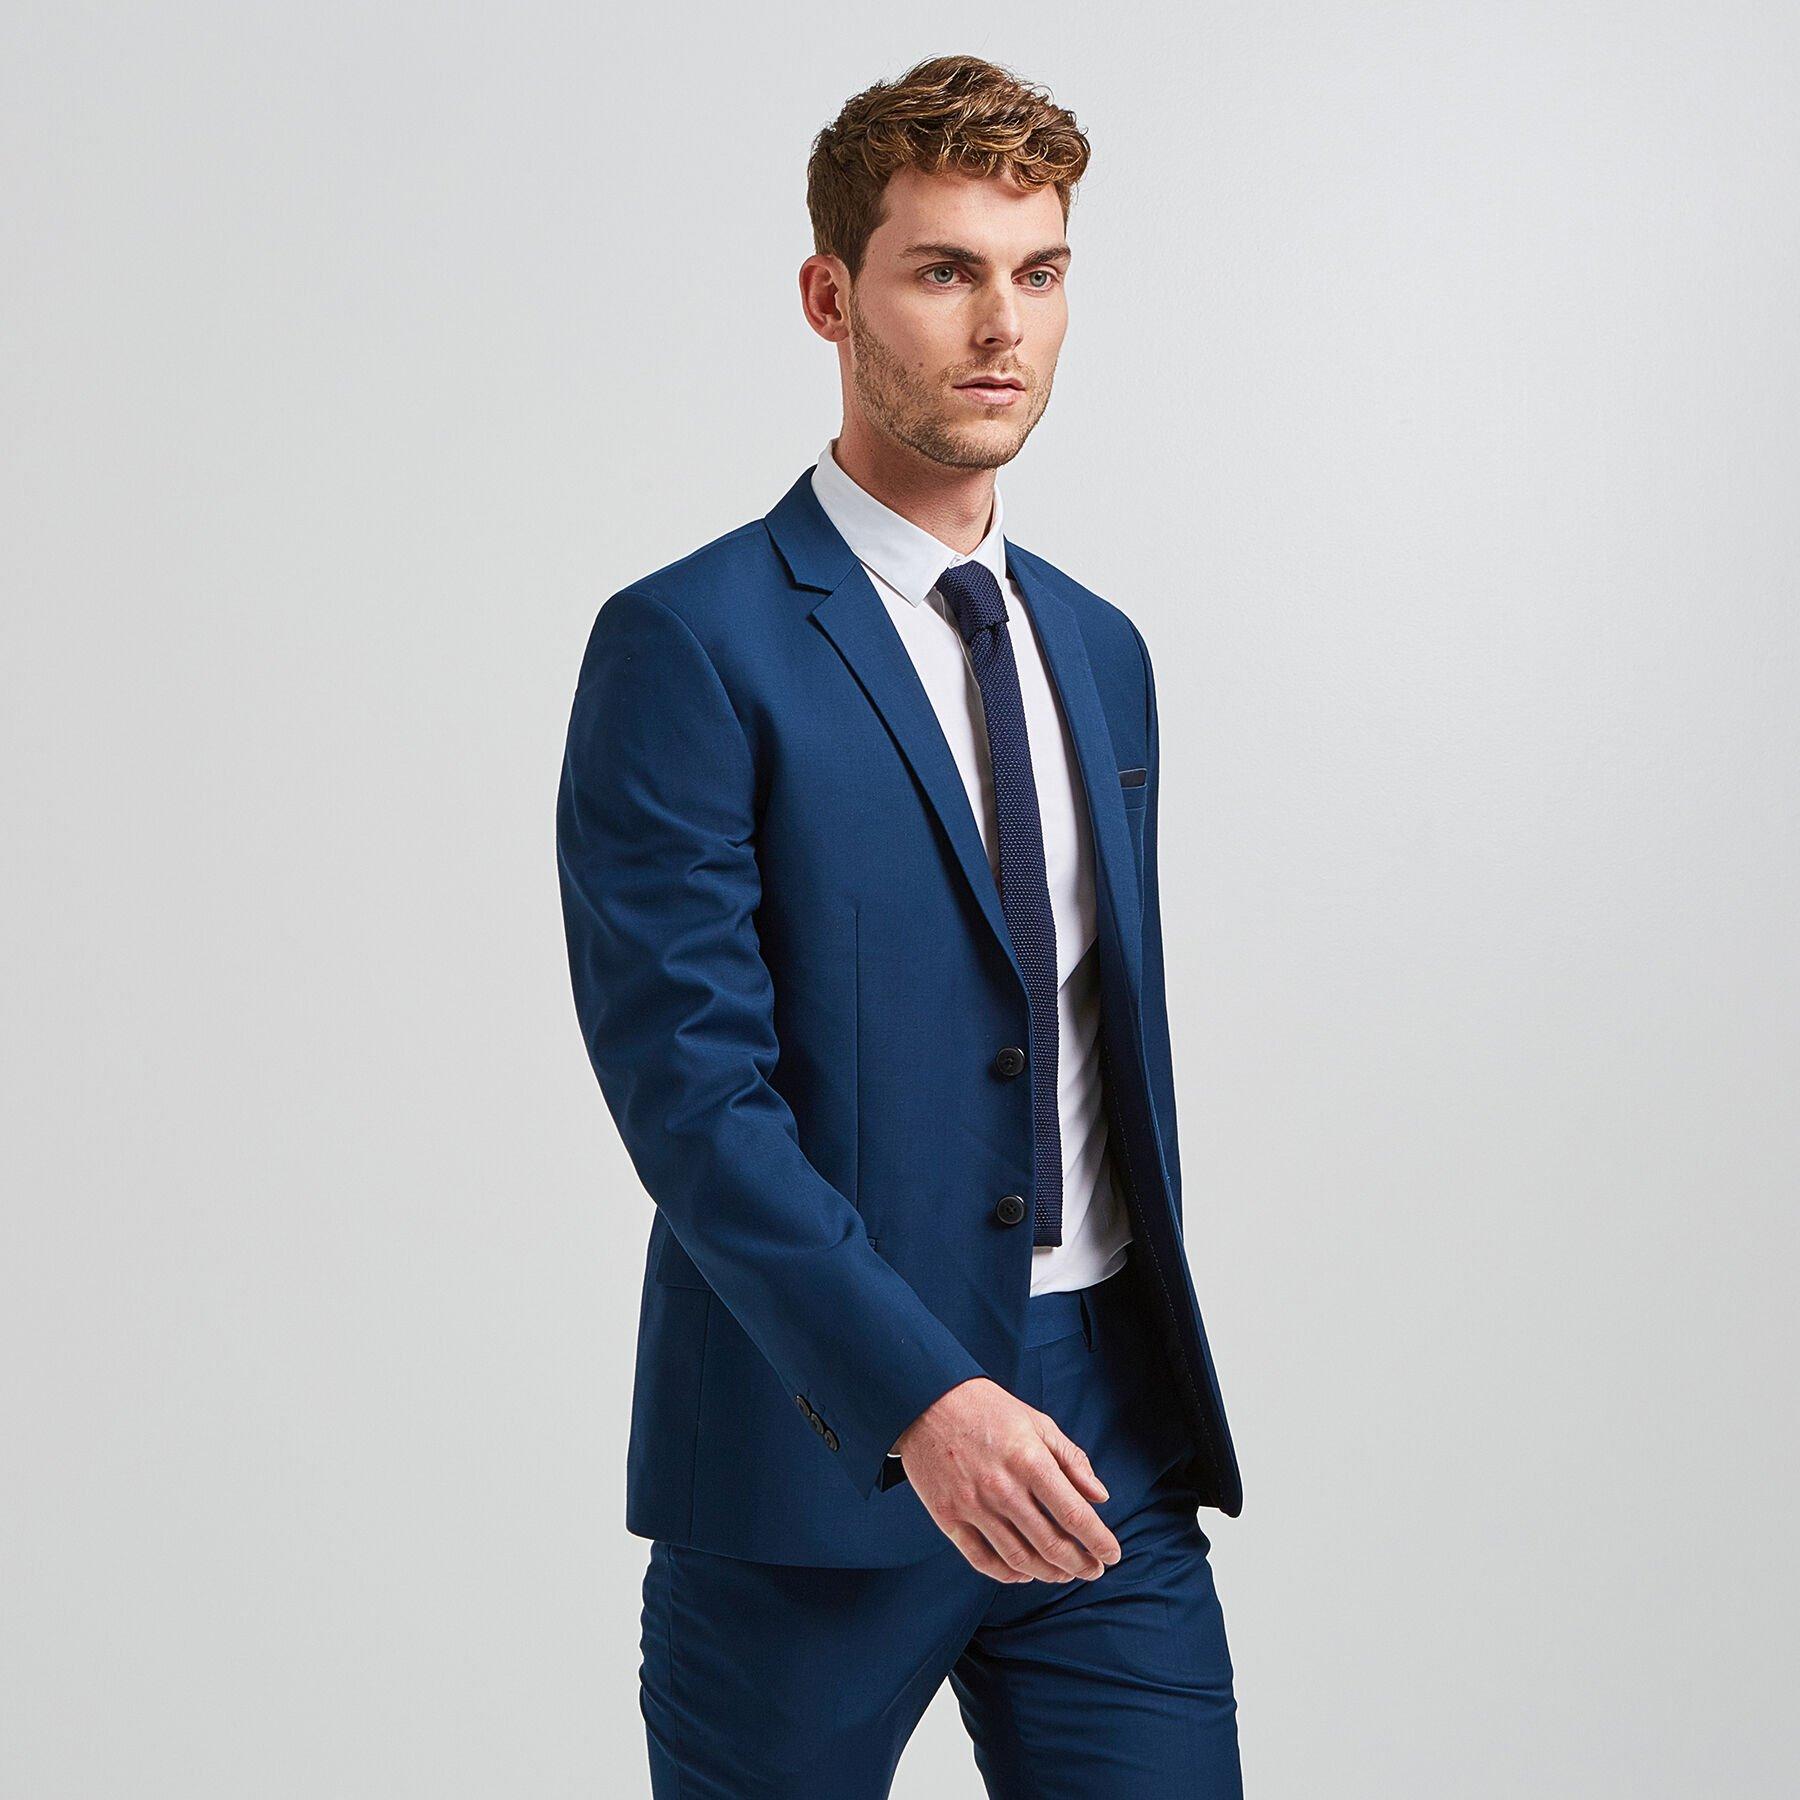 Veste de costume slim Bleu Canard Homme Jules